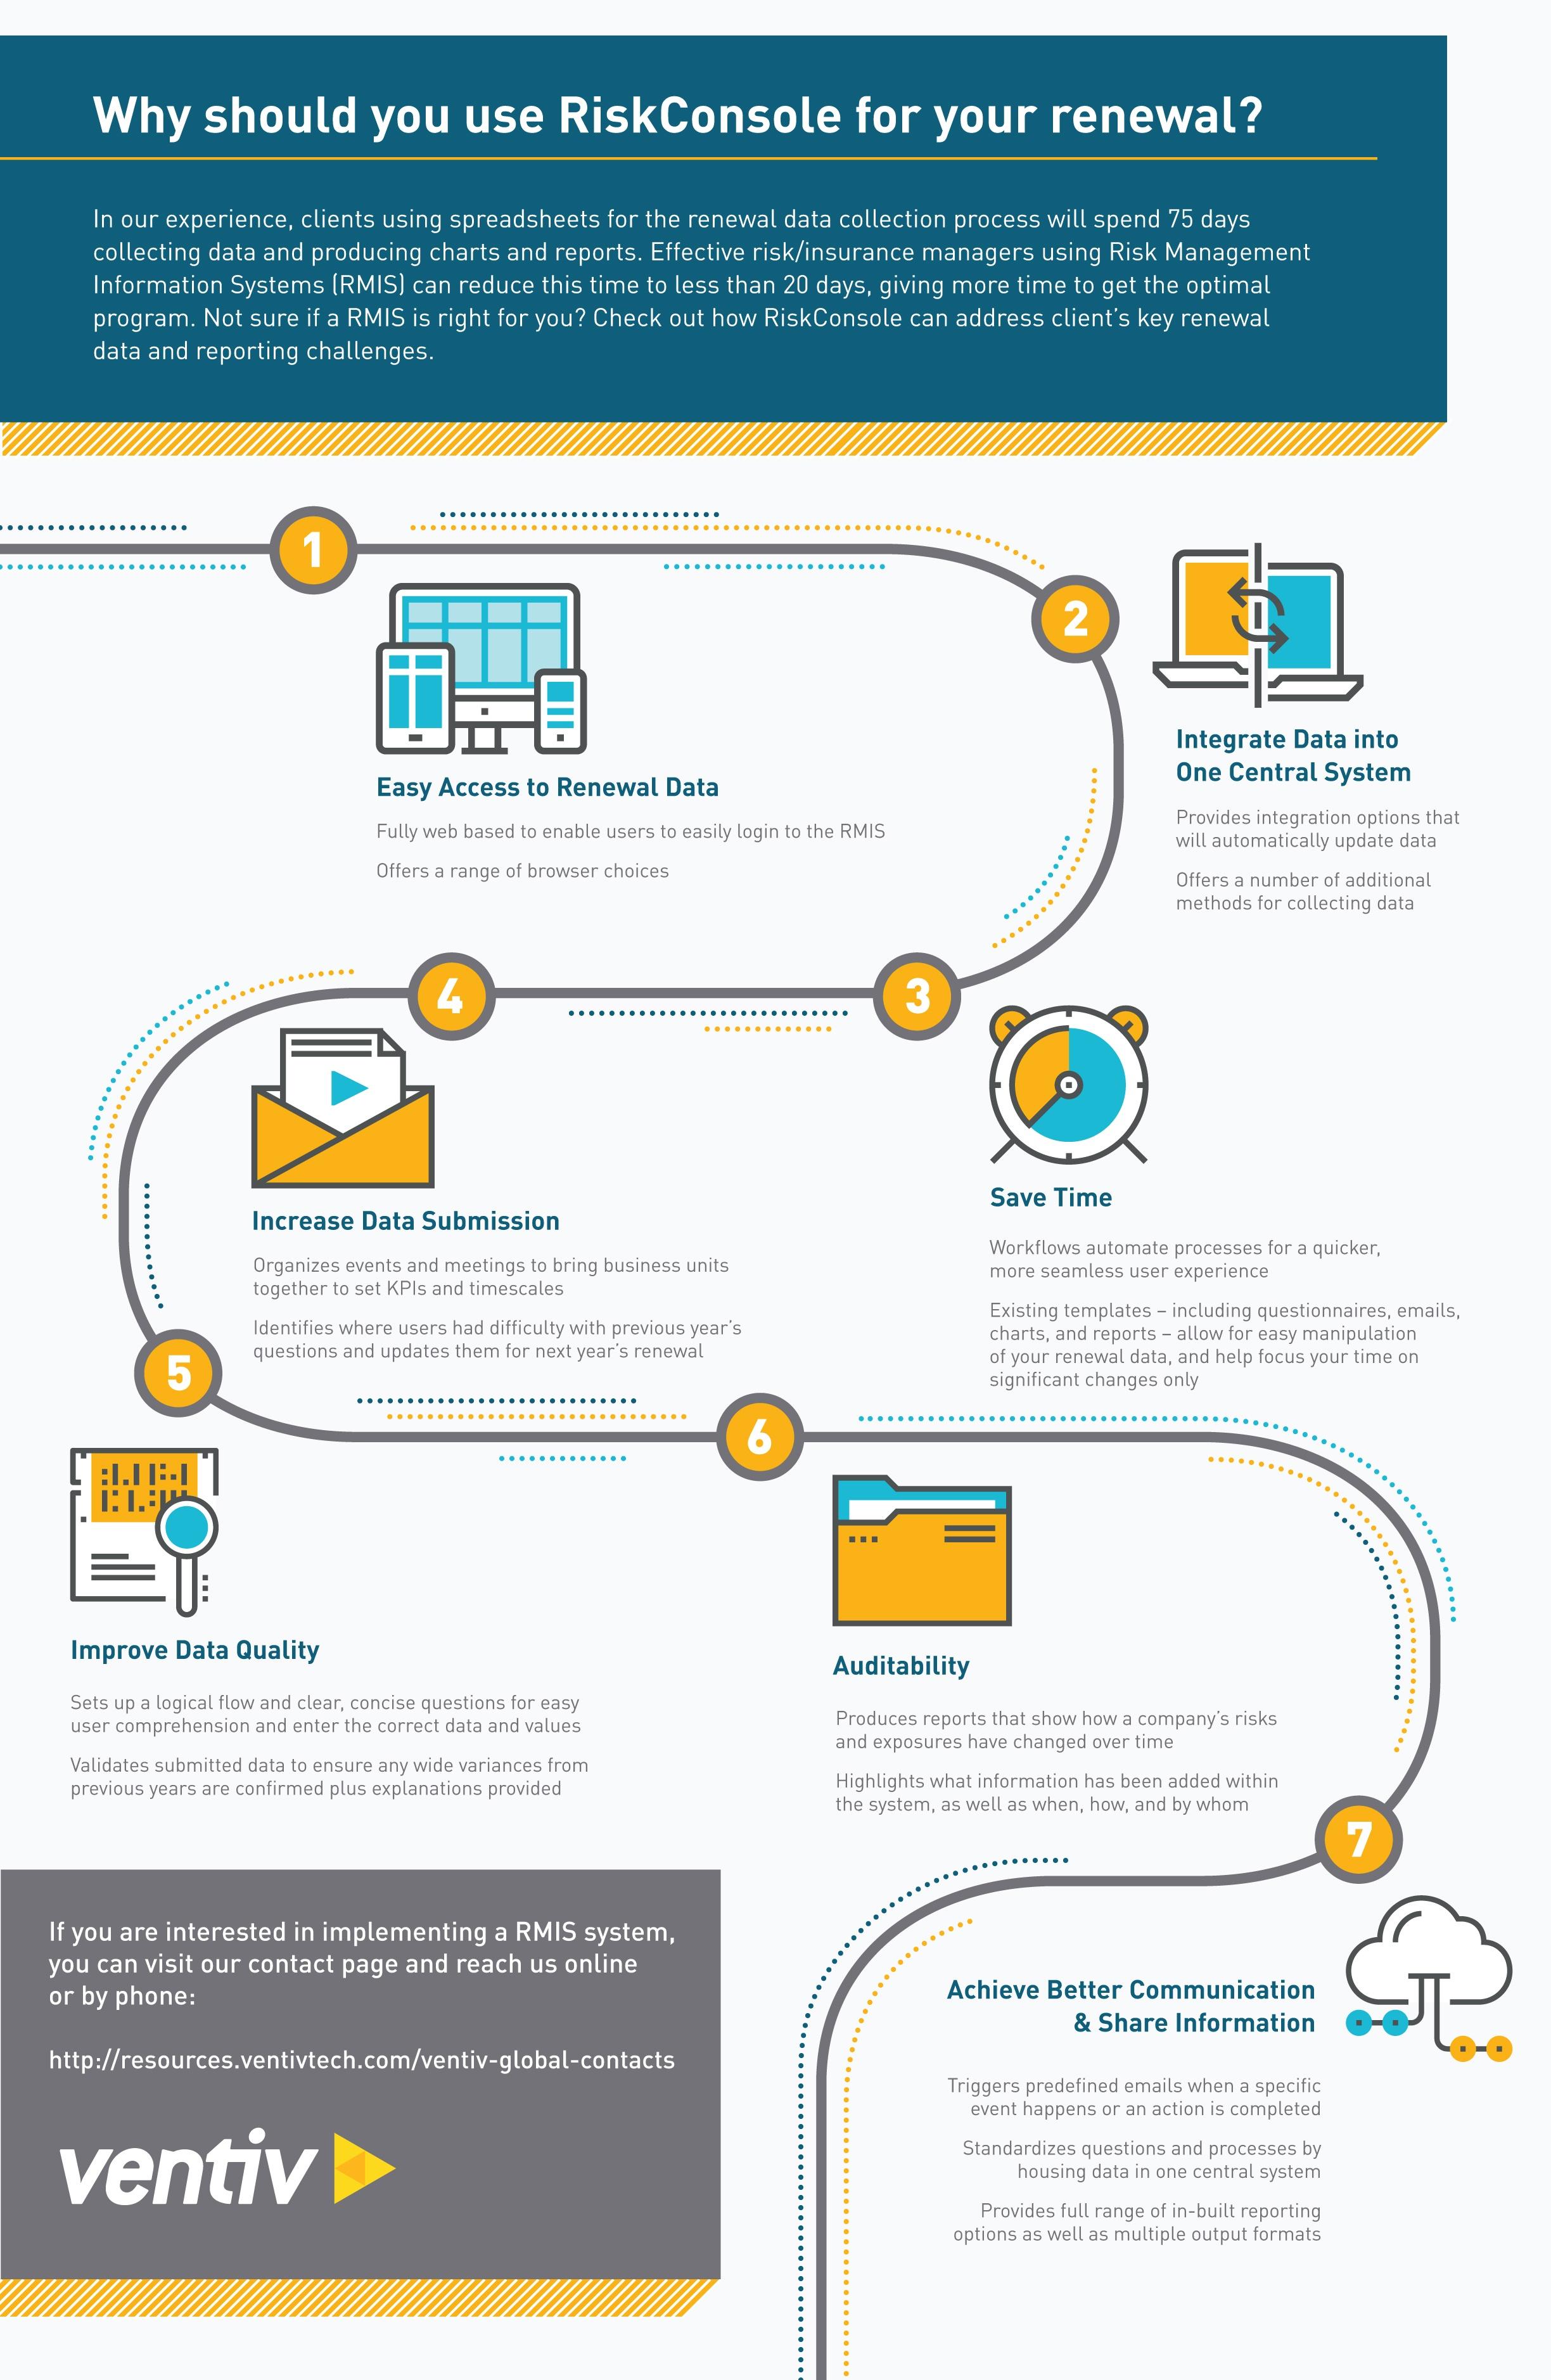 Ventiv_RMISRenewal_Infographic.jpg